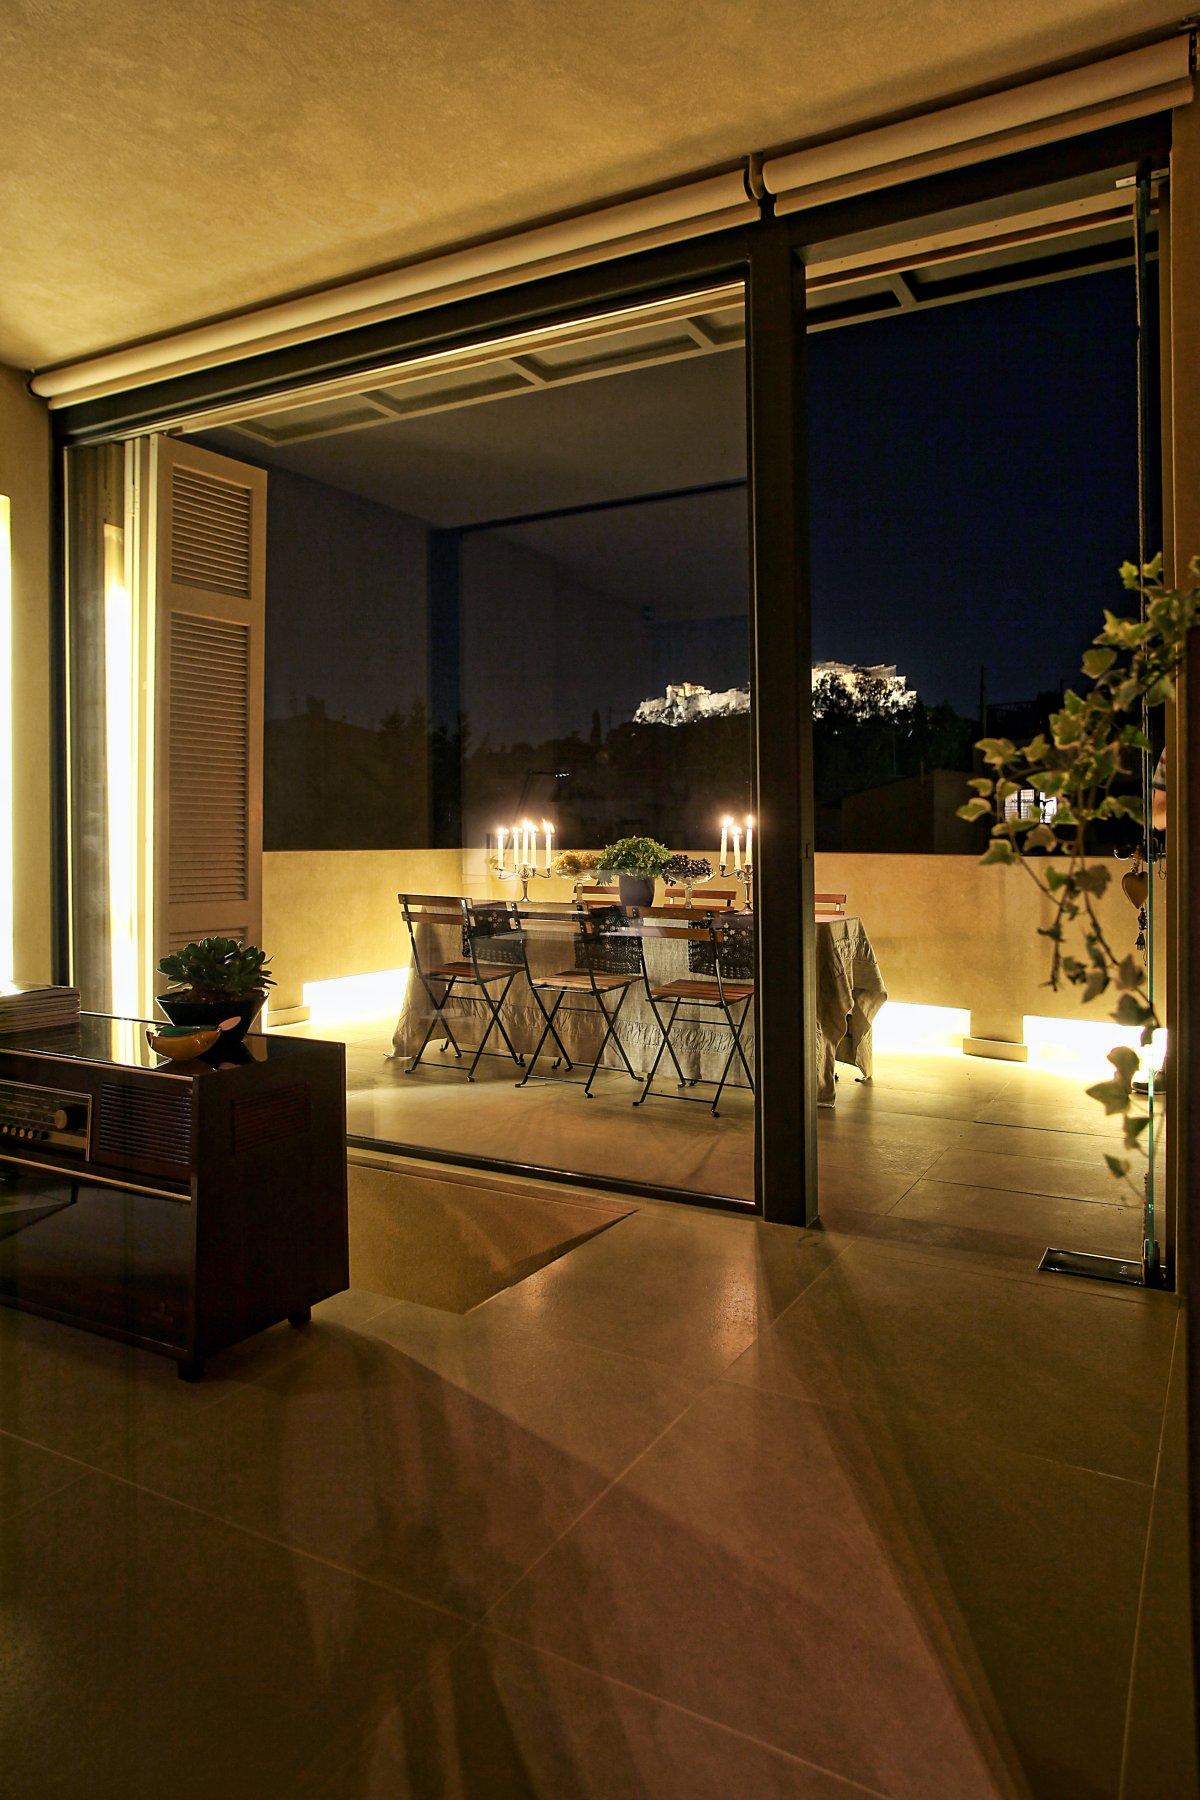 acropolis-view-12